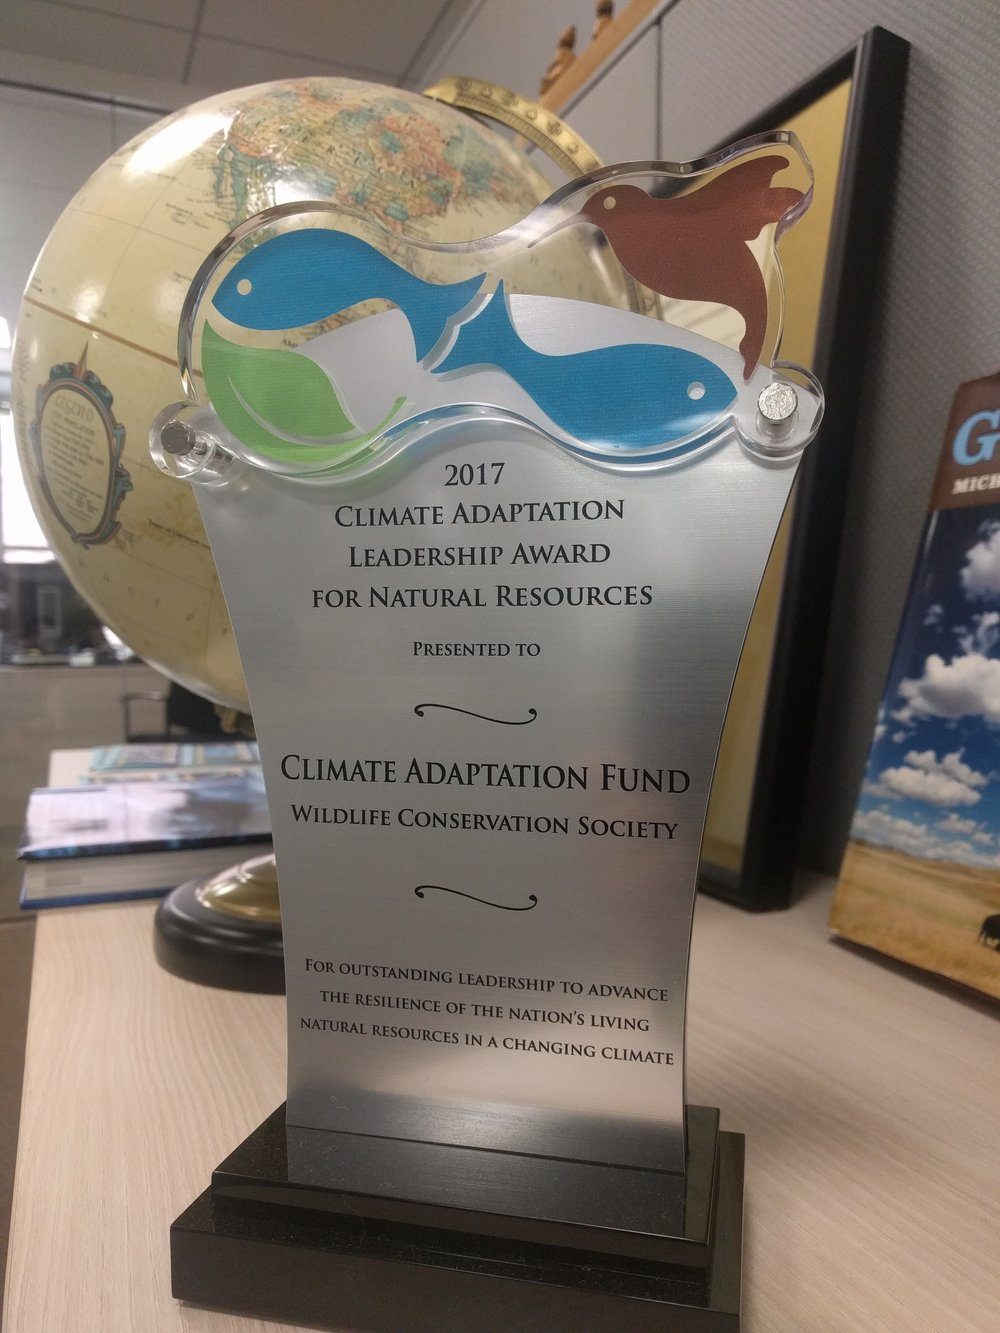 Climateadaptationleadershipaward.jpg